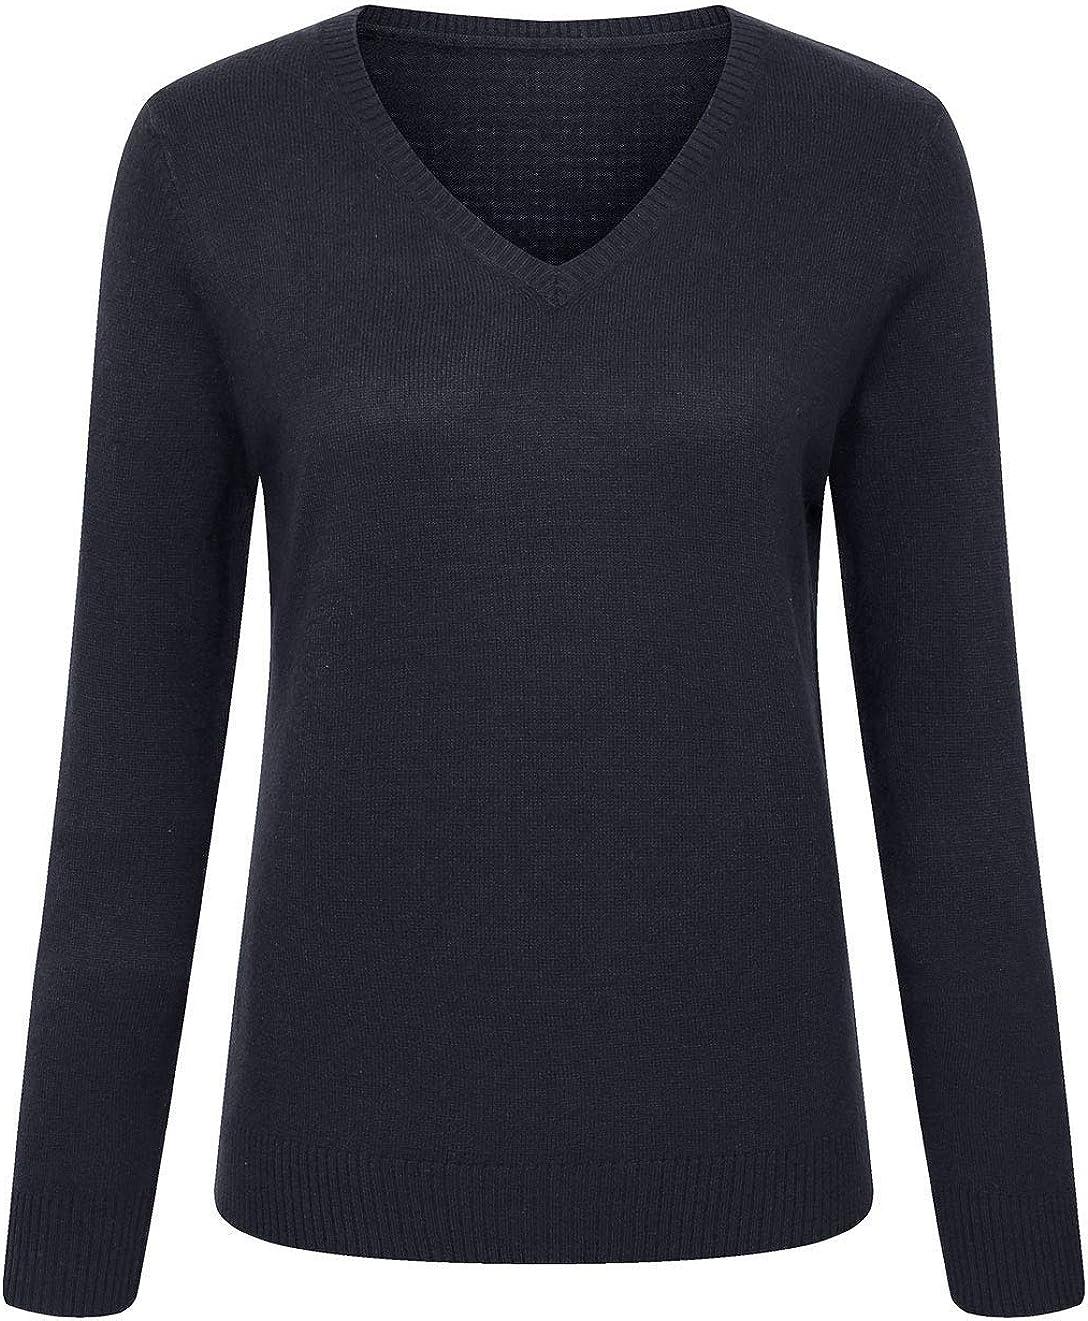 CHARTOU Women's Sexy V-Neck Pullover Knitwear Cashmere-Like Max 72% OFF unisex Swea